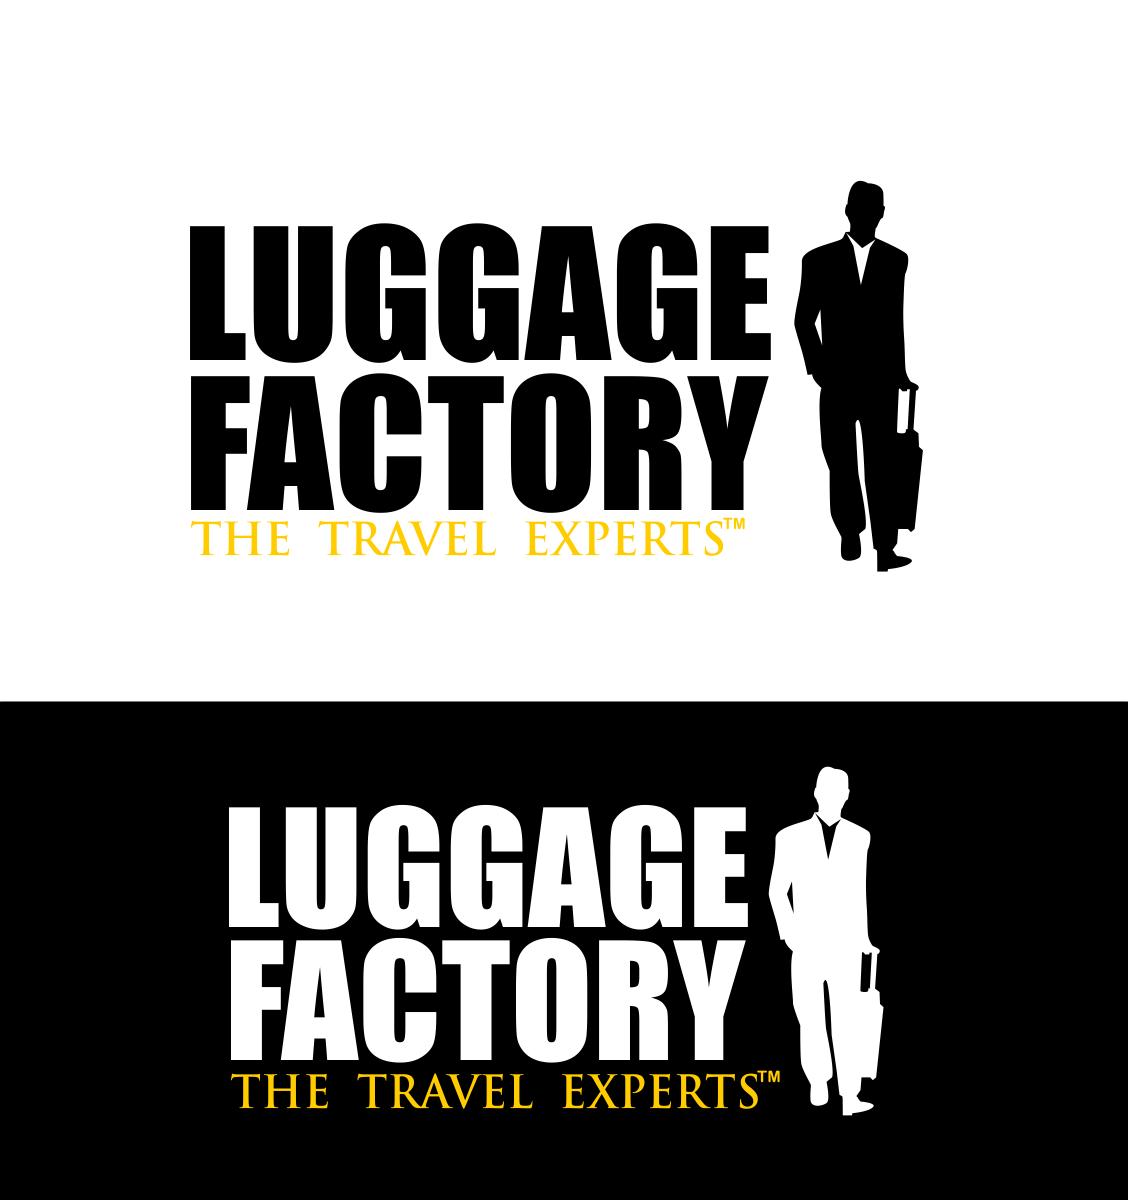 Logo Design by Agus Martoyo - Entry No. 236 in the Logo Design Contest Creative Logo Design for Luggage Factory.